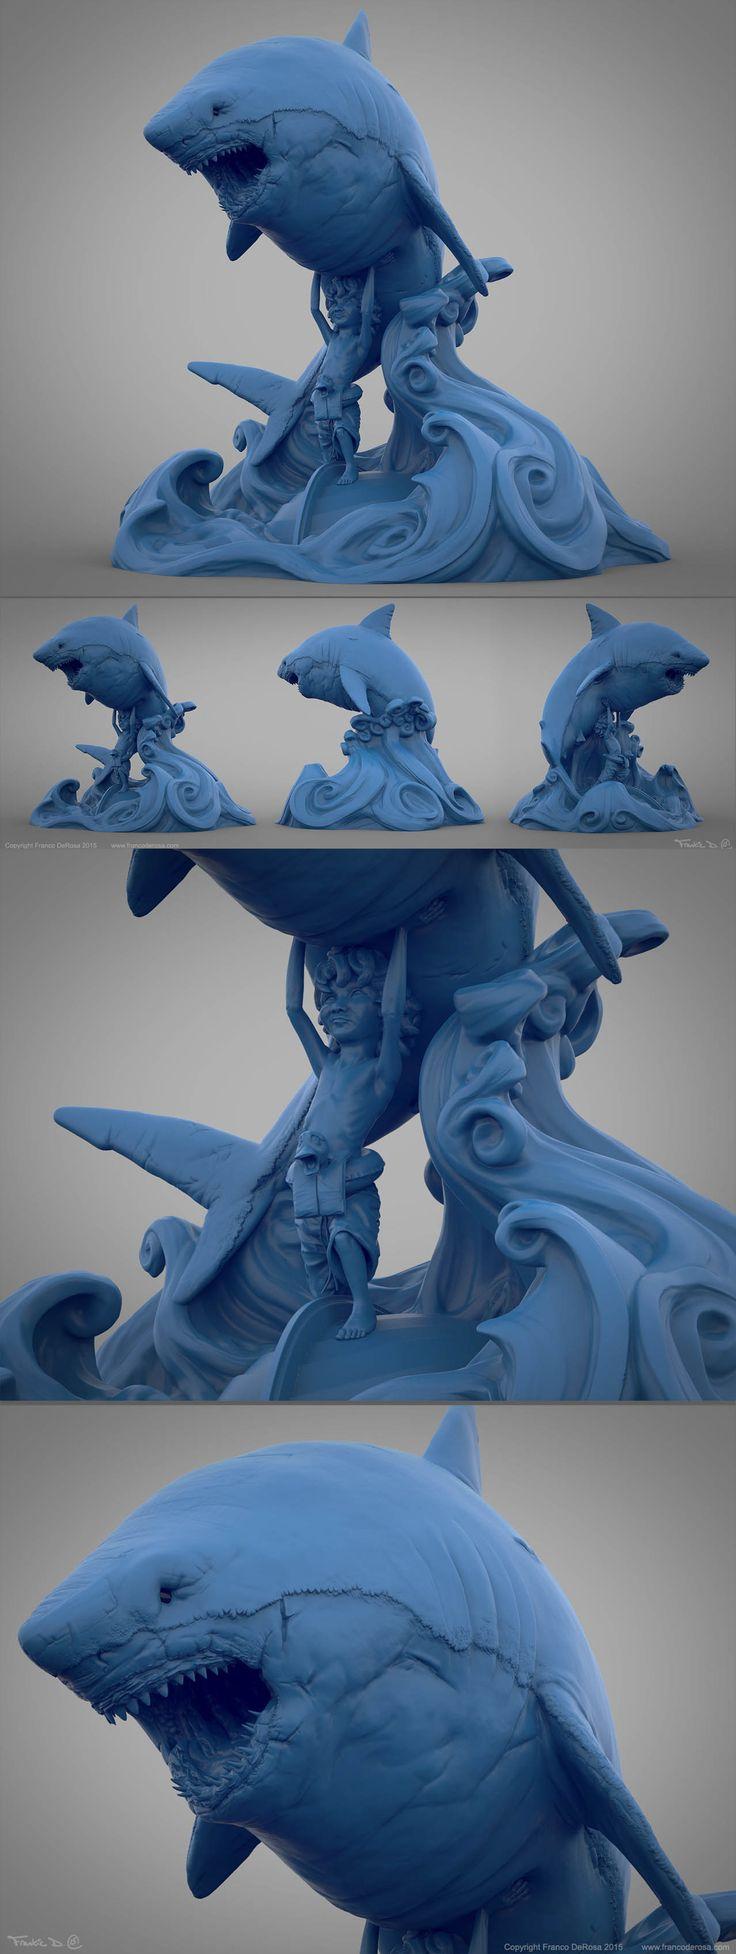 Shark Bait by Franco DeRosa